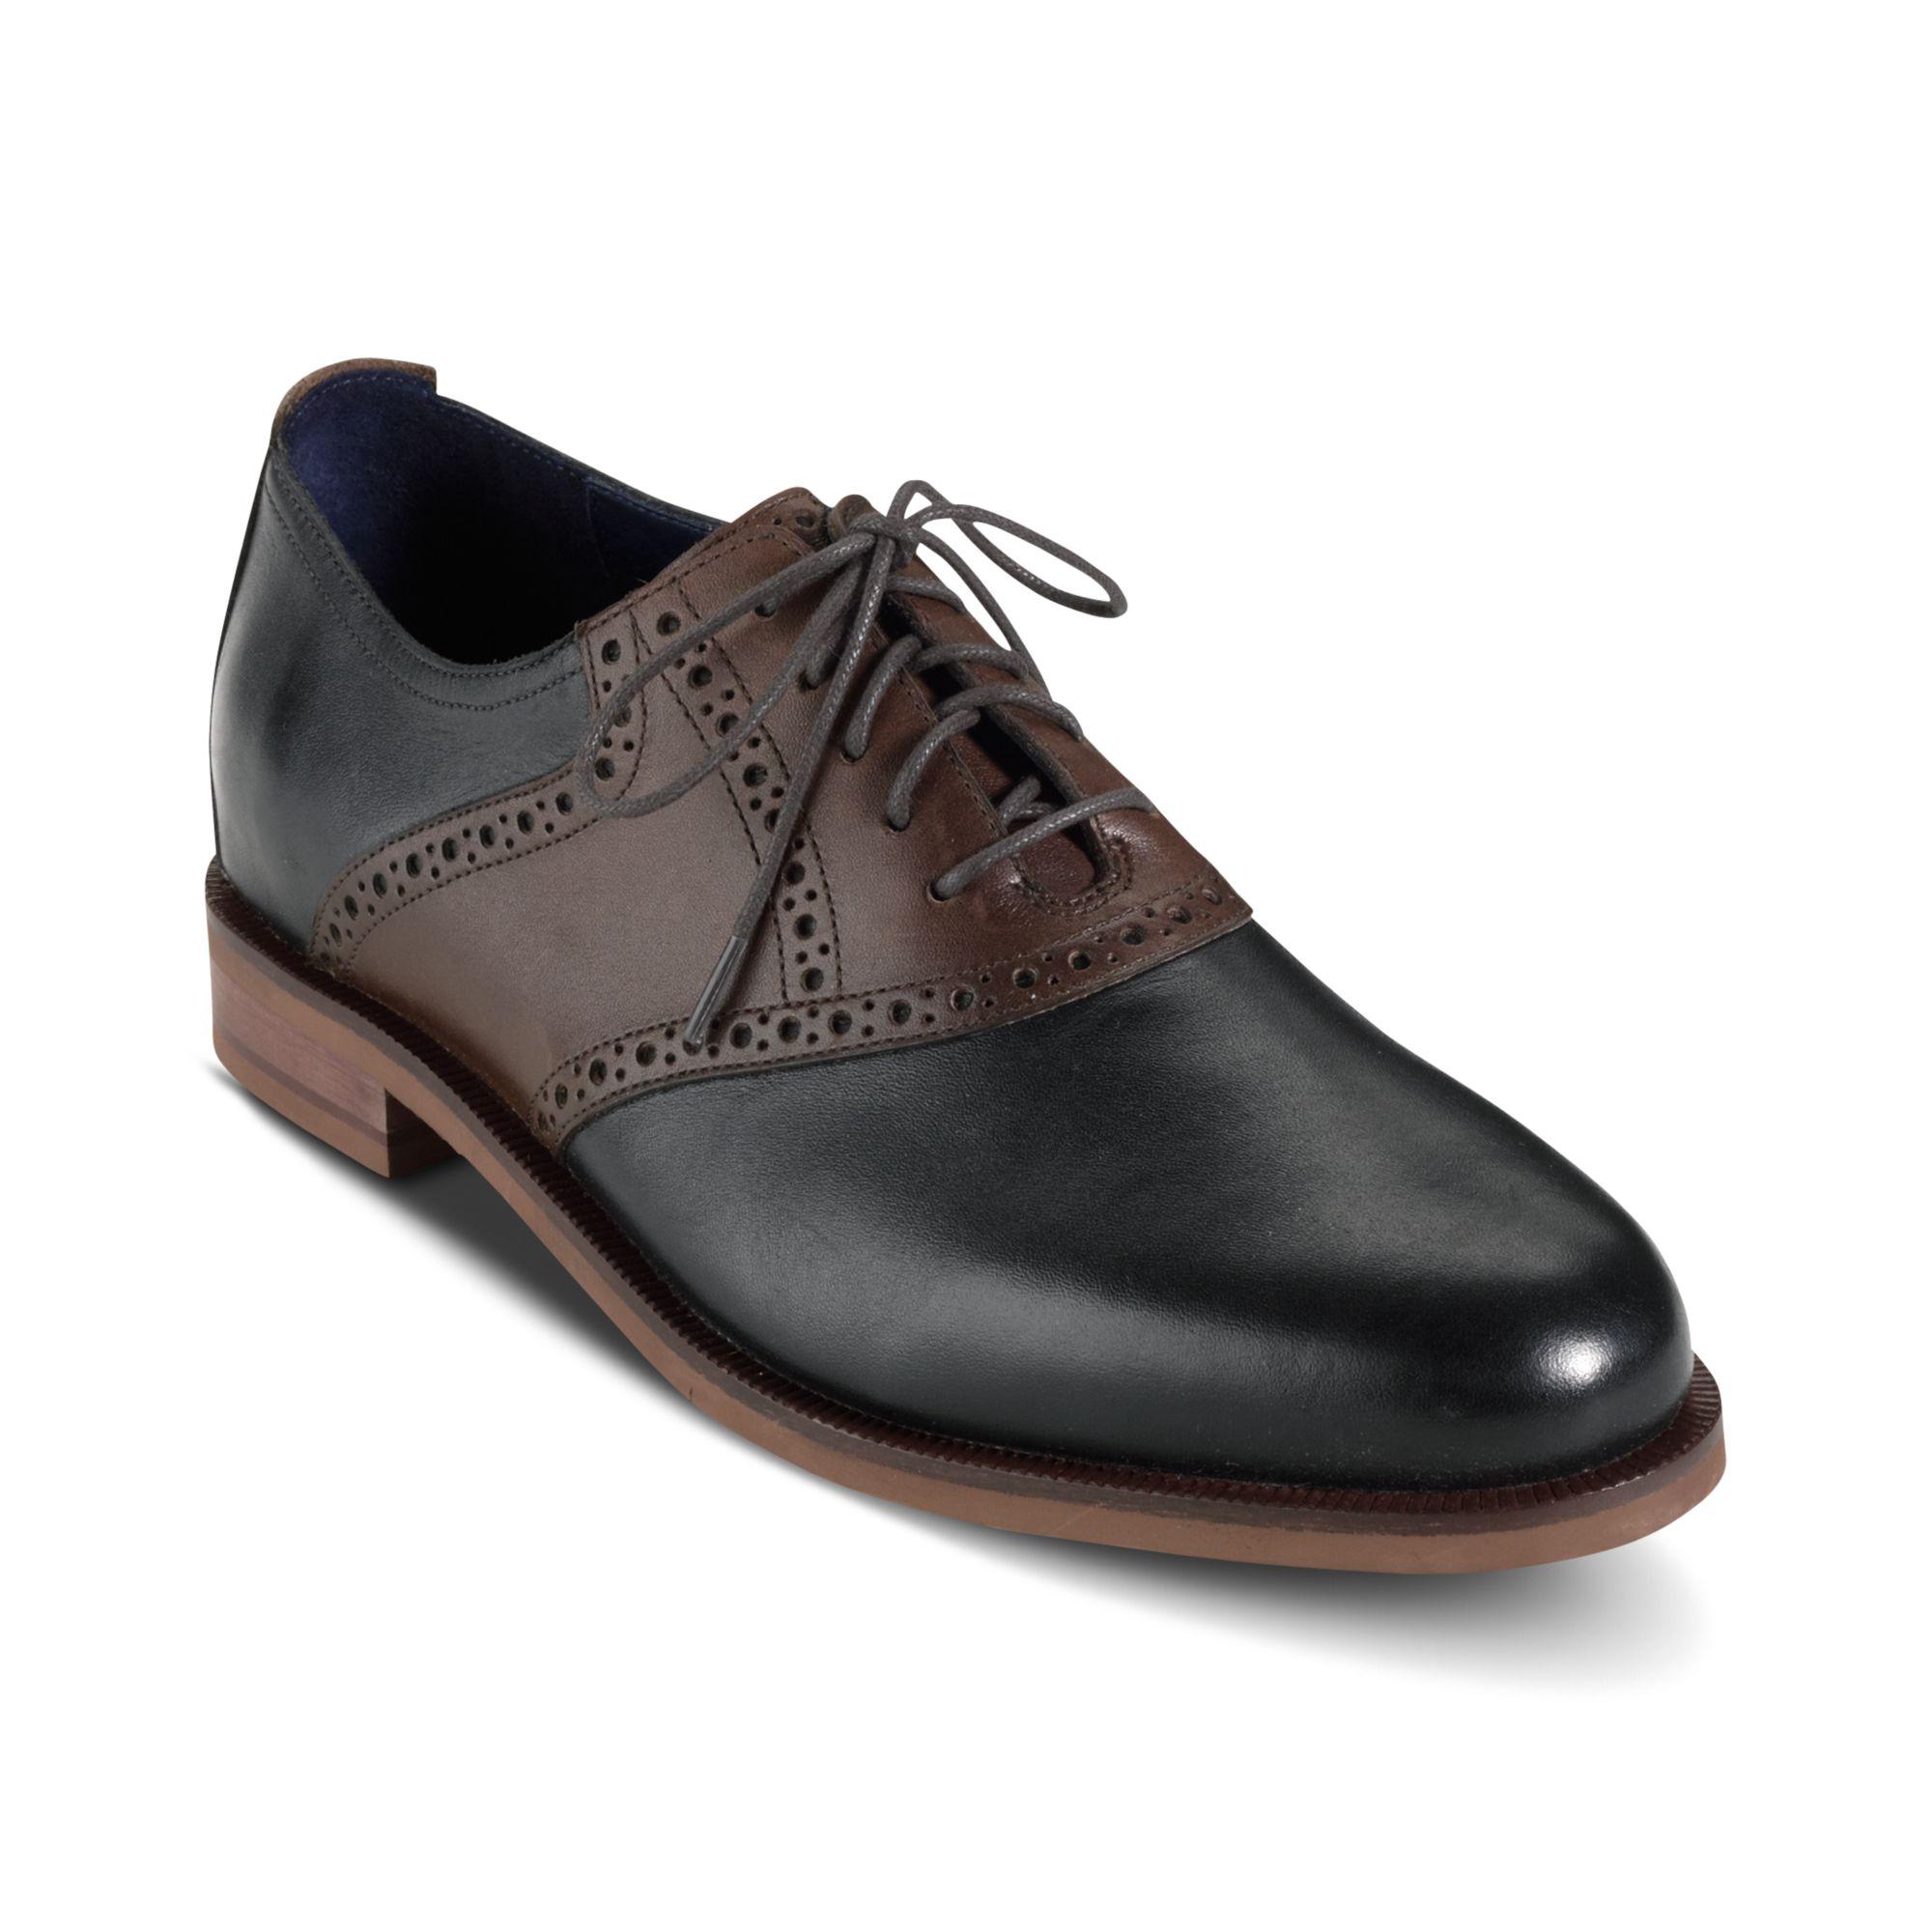 Cole Haan Mens Saddle Shoes